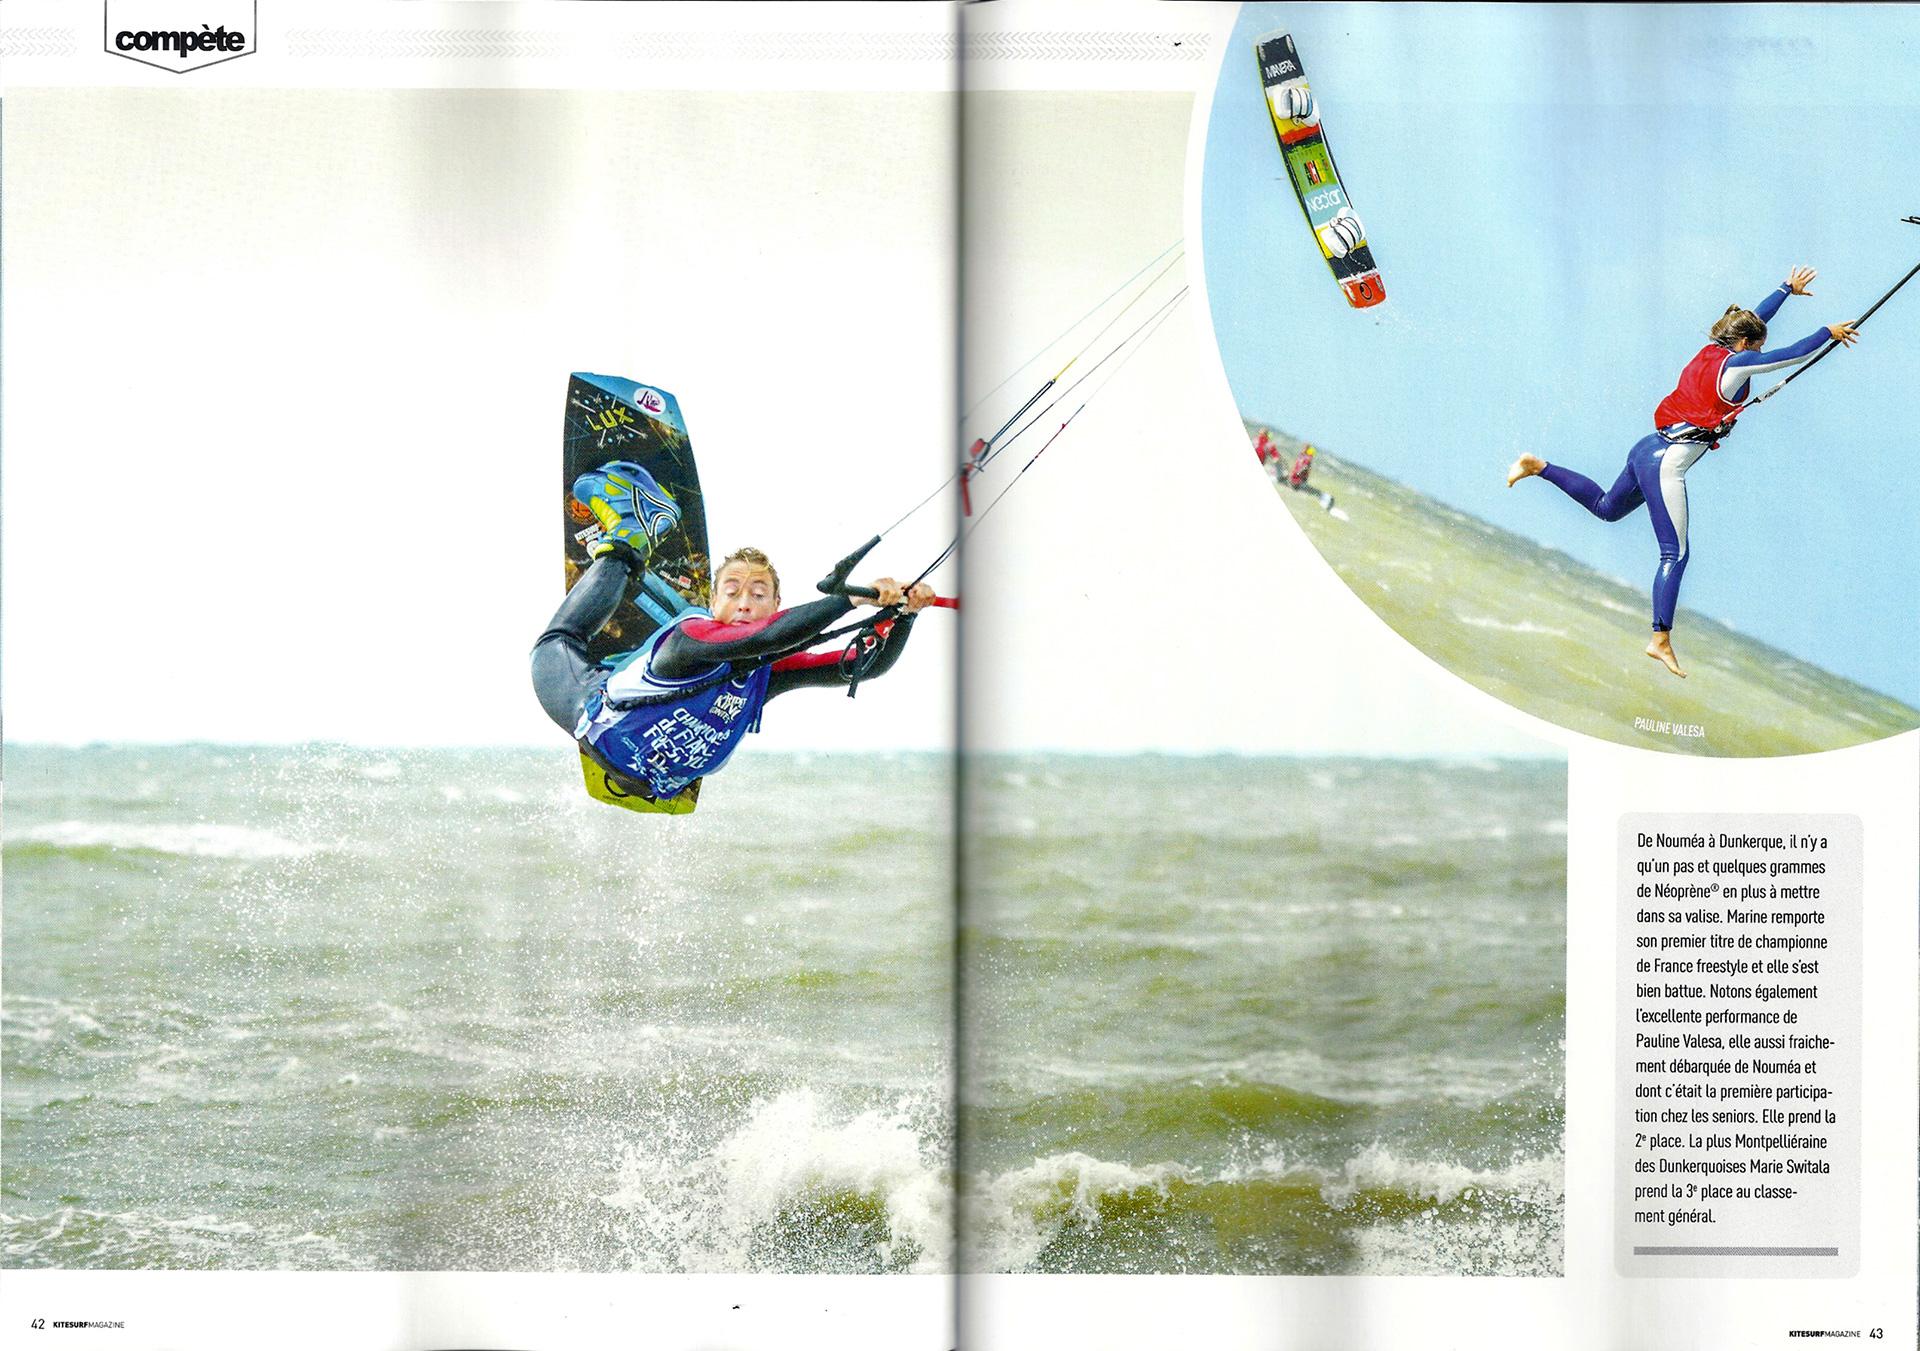 KitesurfMagOctobre2015-P4